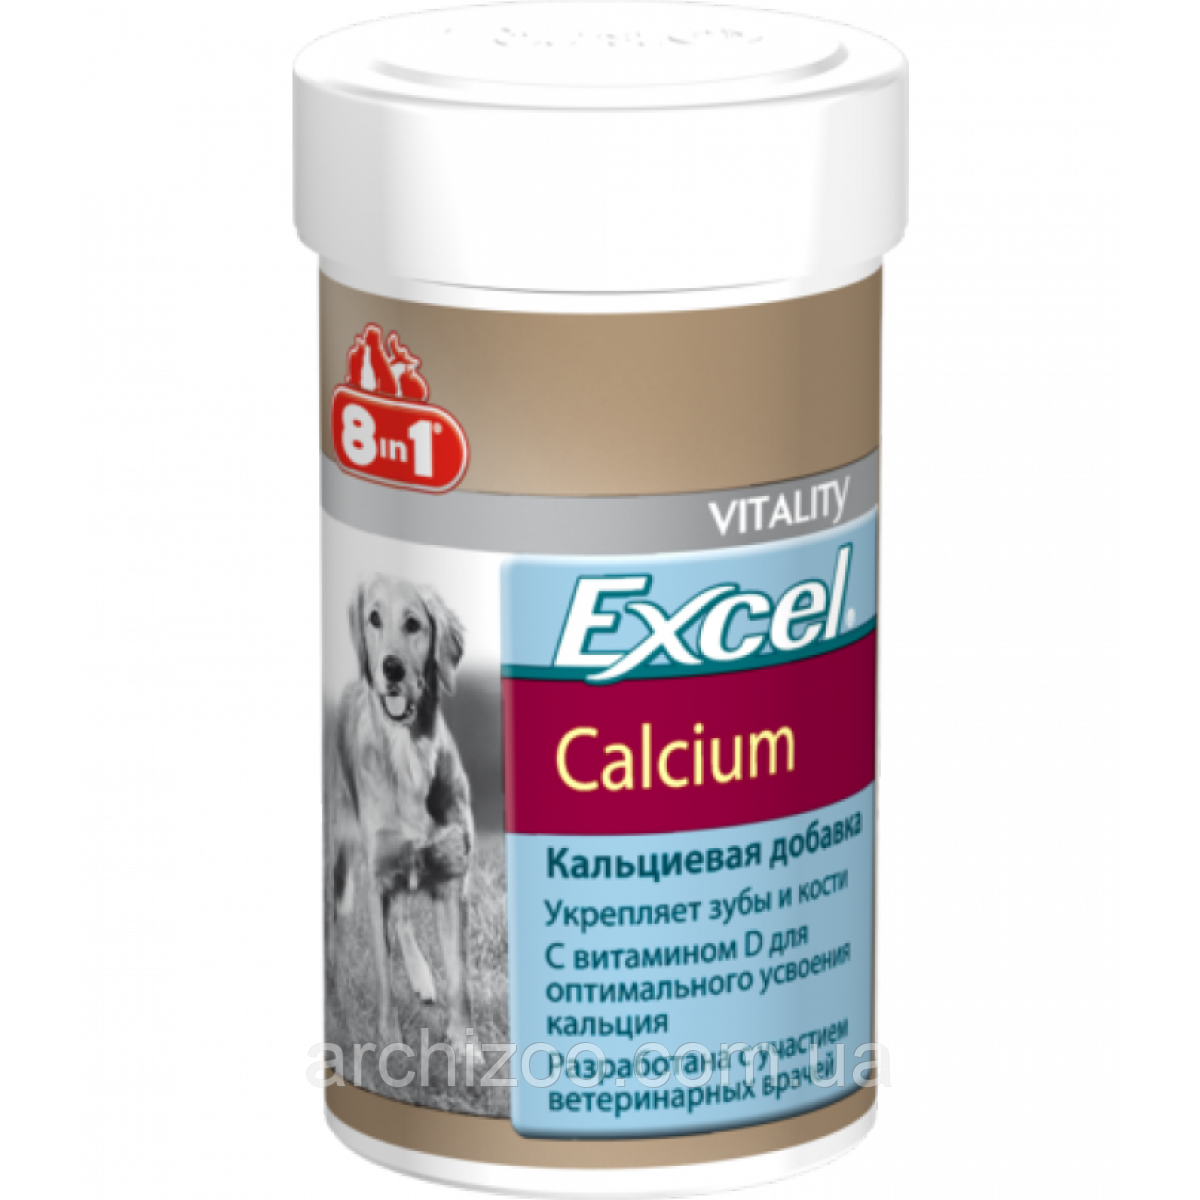 8in1  Excel Calcium - кальциевая добавка для собак 470таб (109433)